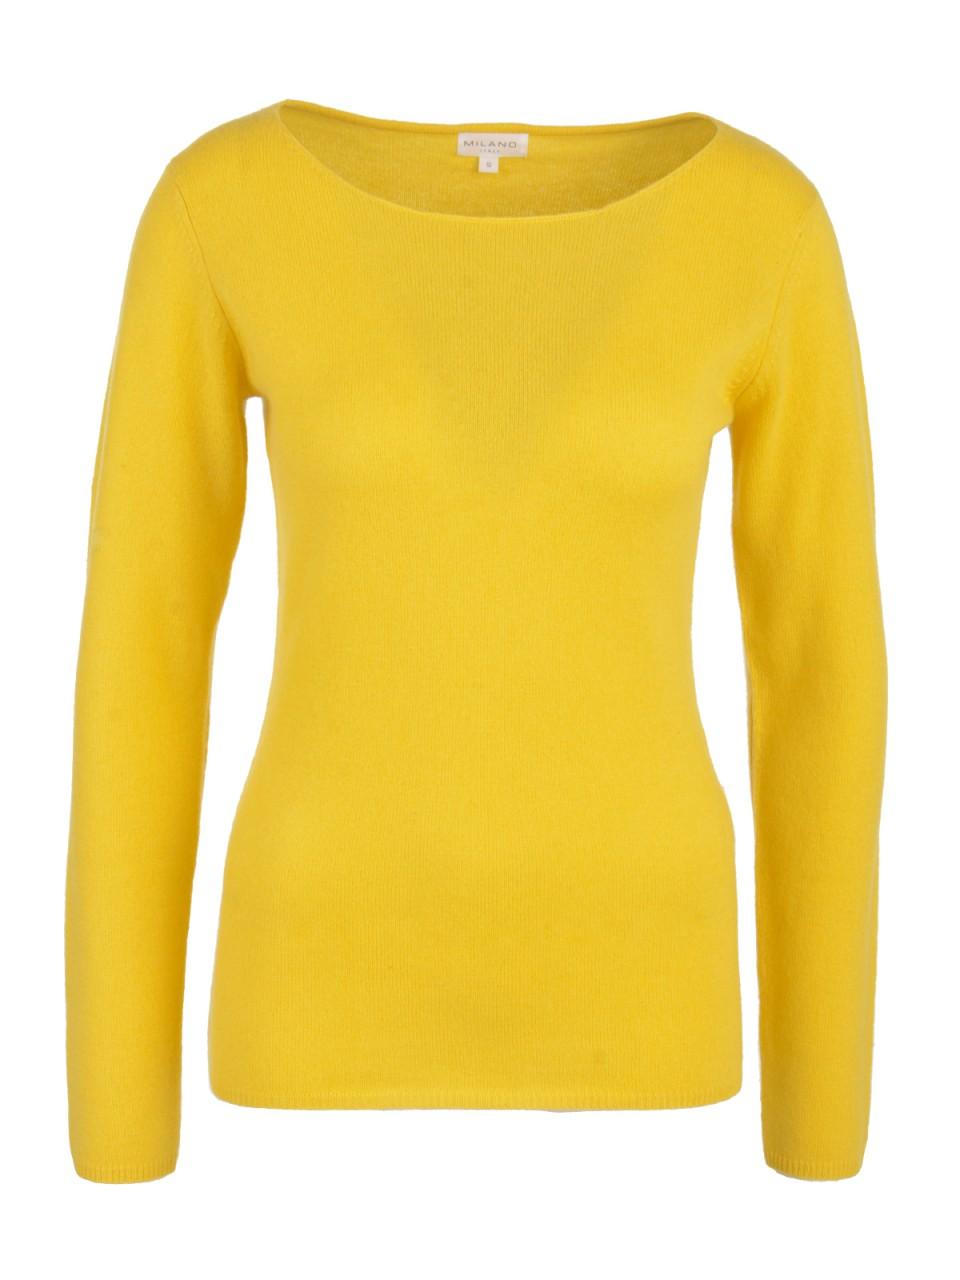 Oberteile - Milano Italy Damen Kaschmir Pullover, gelb  - Onlineshop Designermode.com